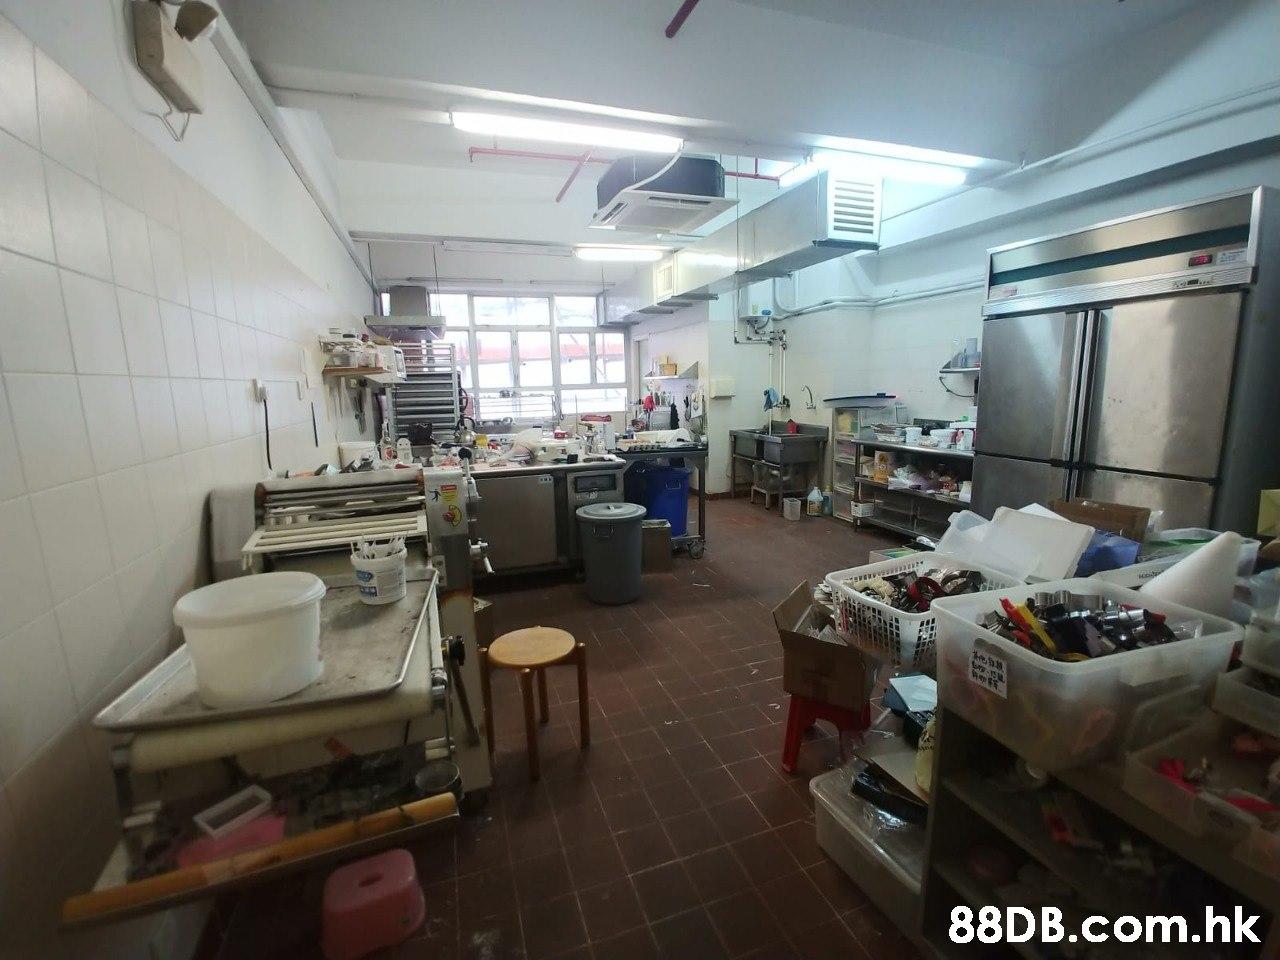 ry-15 et .hk  Building,Property,Room,Interior design,